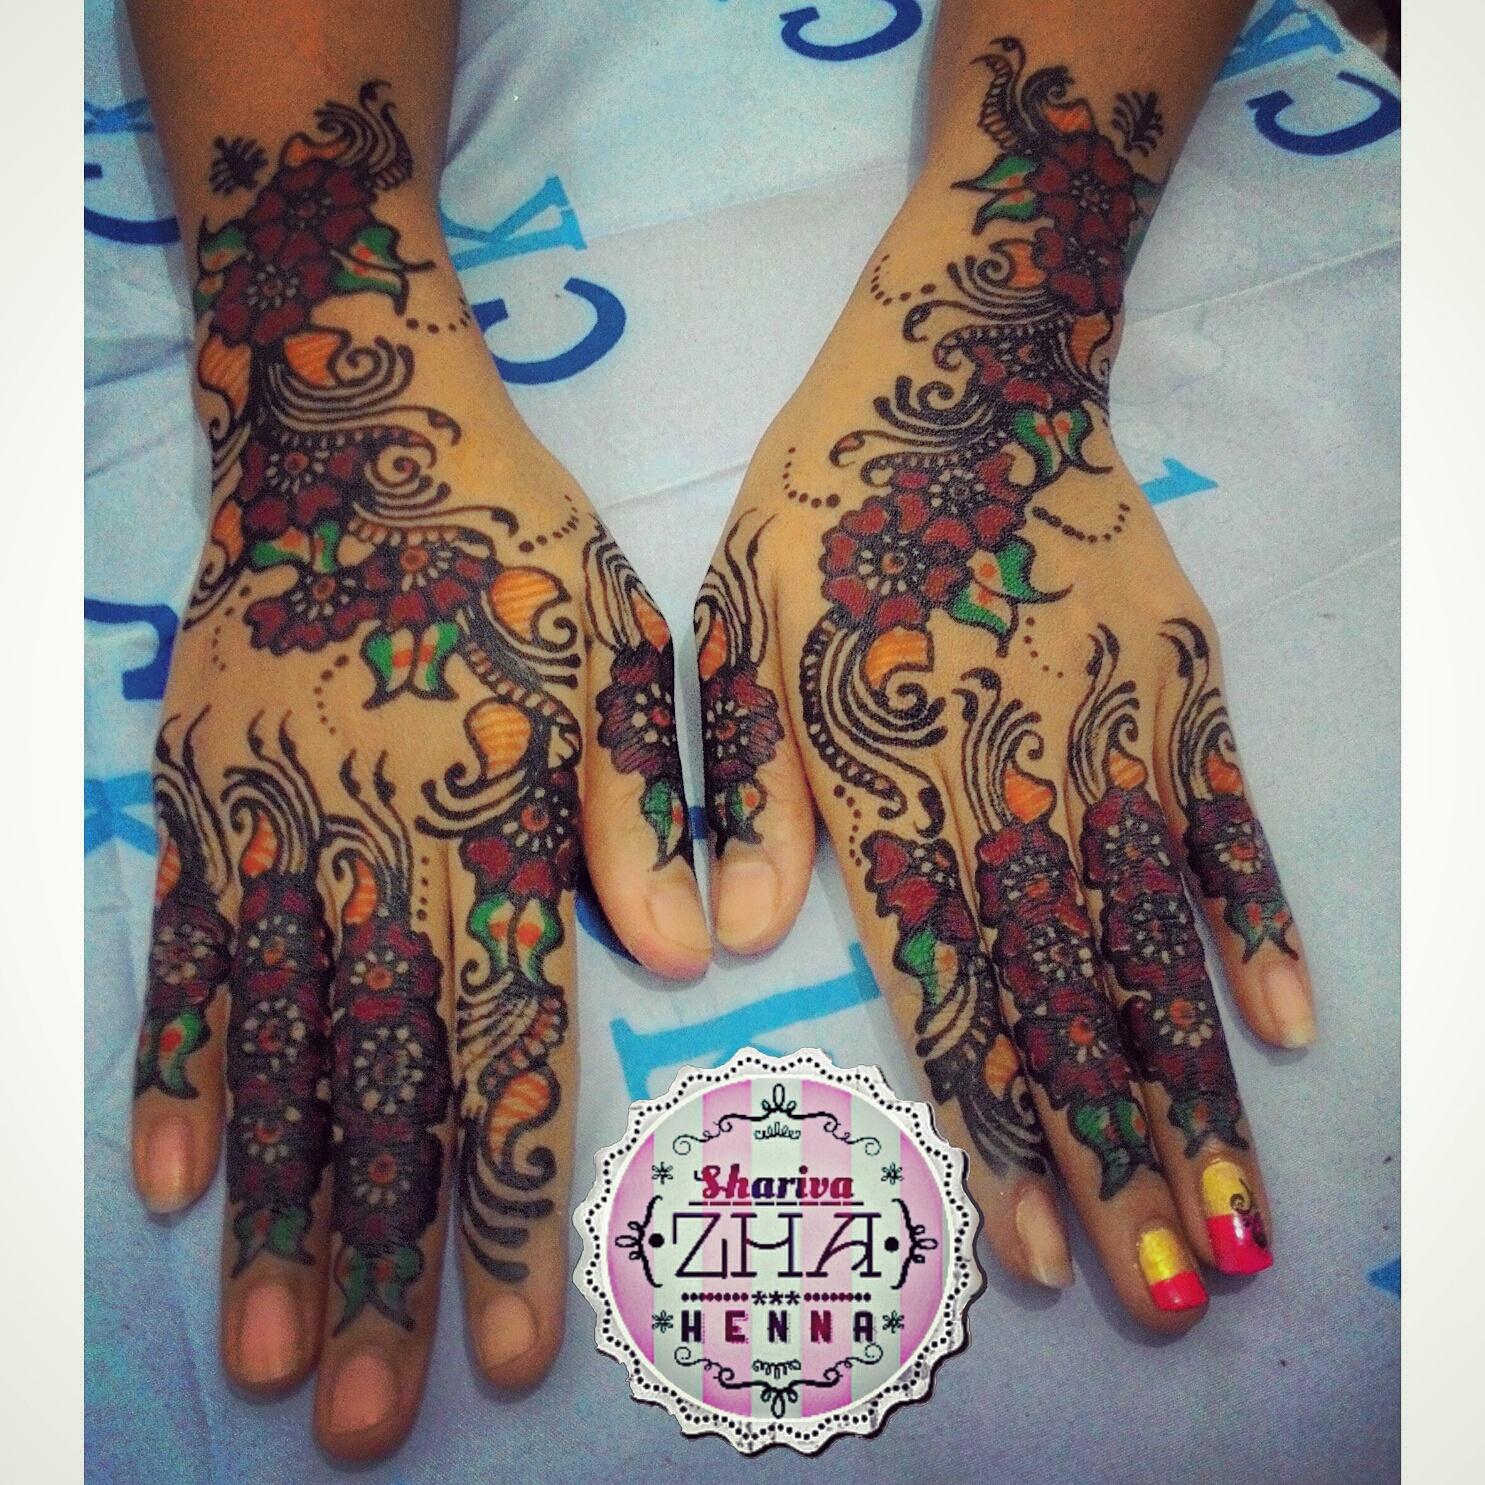 Shariva Zha Henna Jakarta Desain Henna Simple Wedding 01